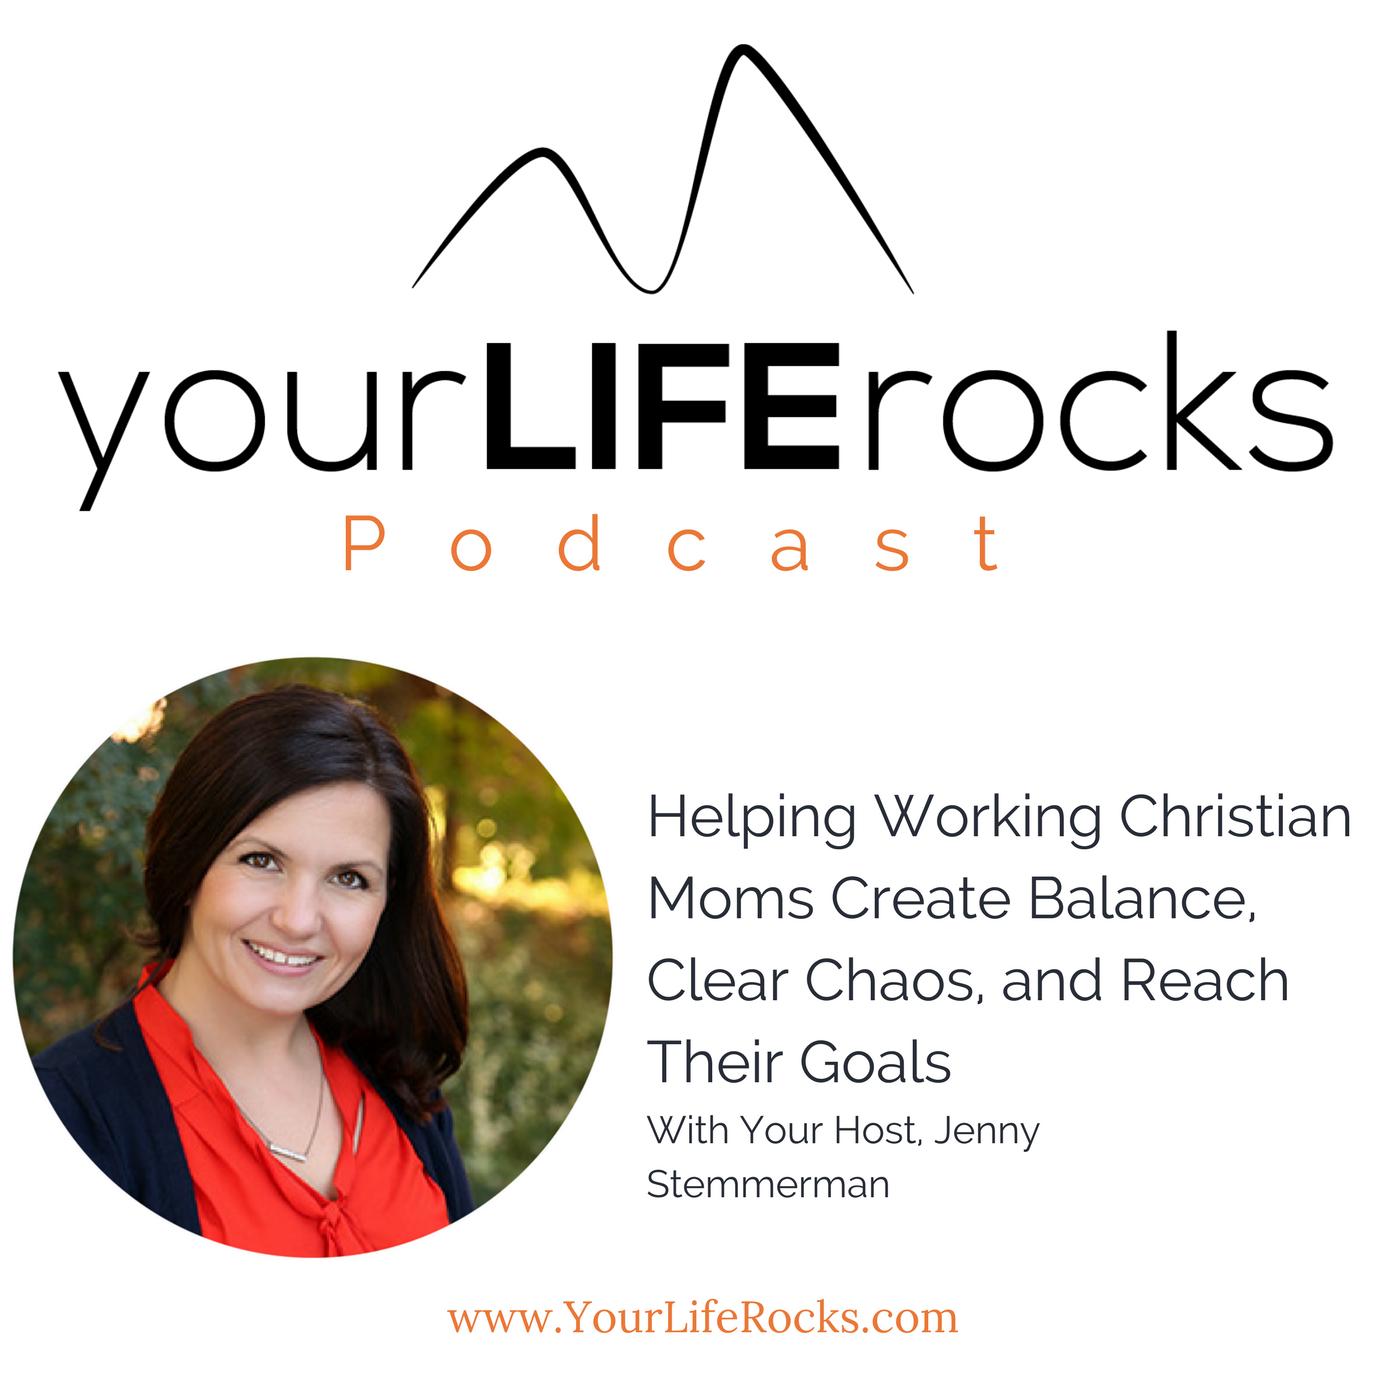 Your Life Rocks: Life Balance for Christian Working Moms